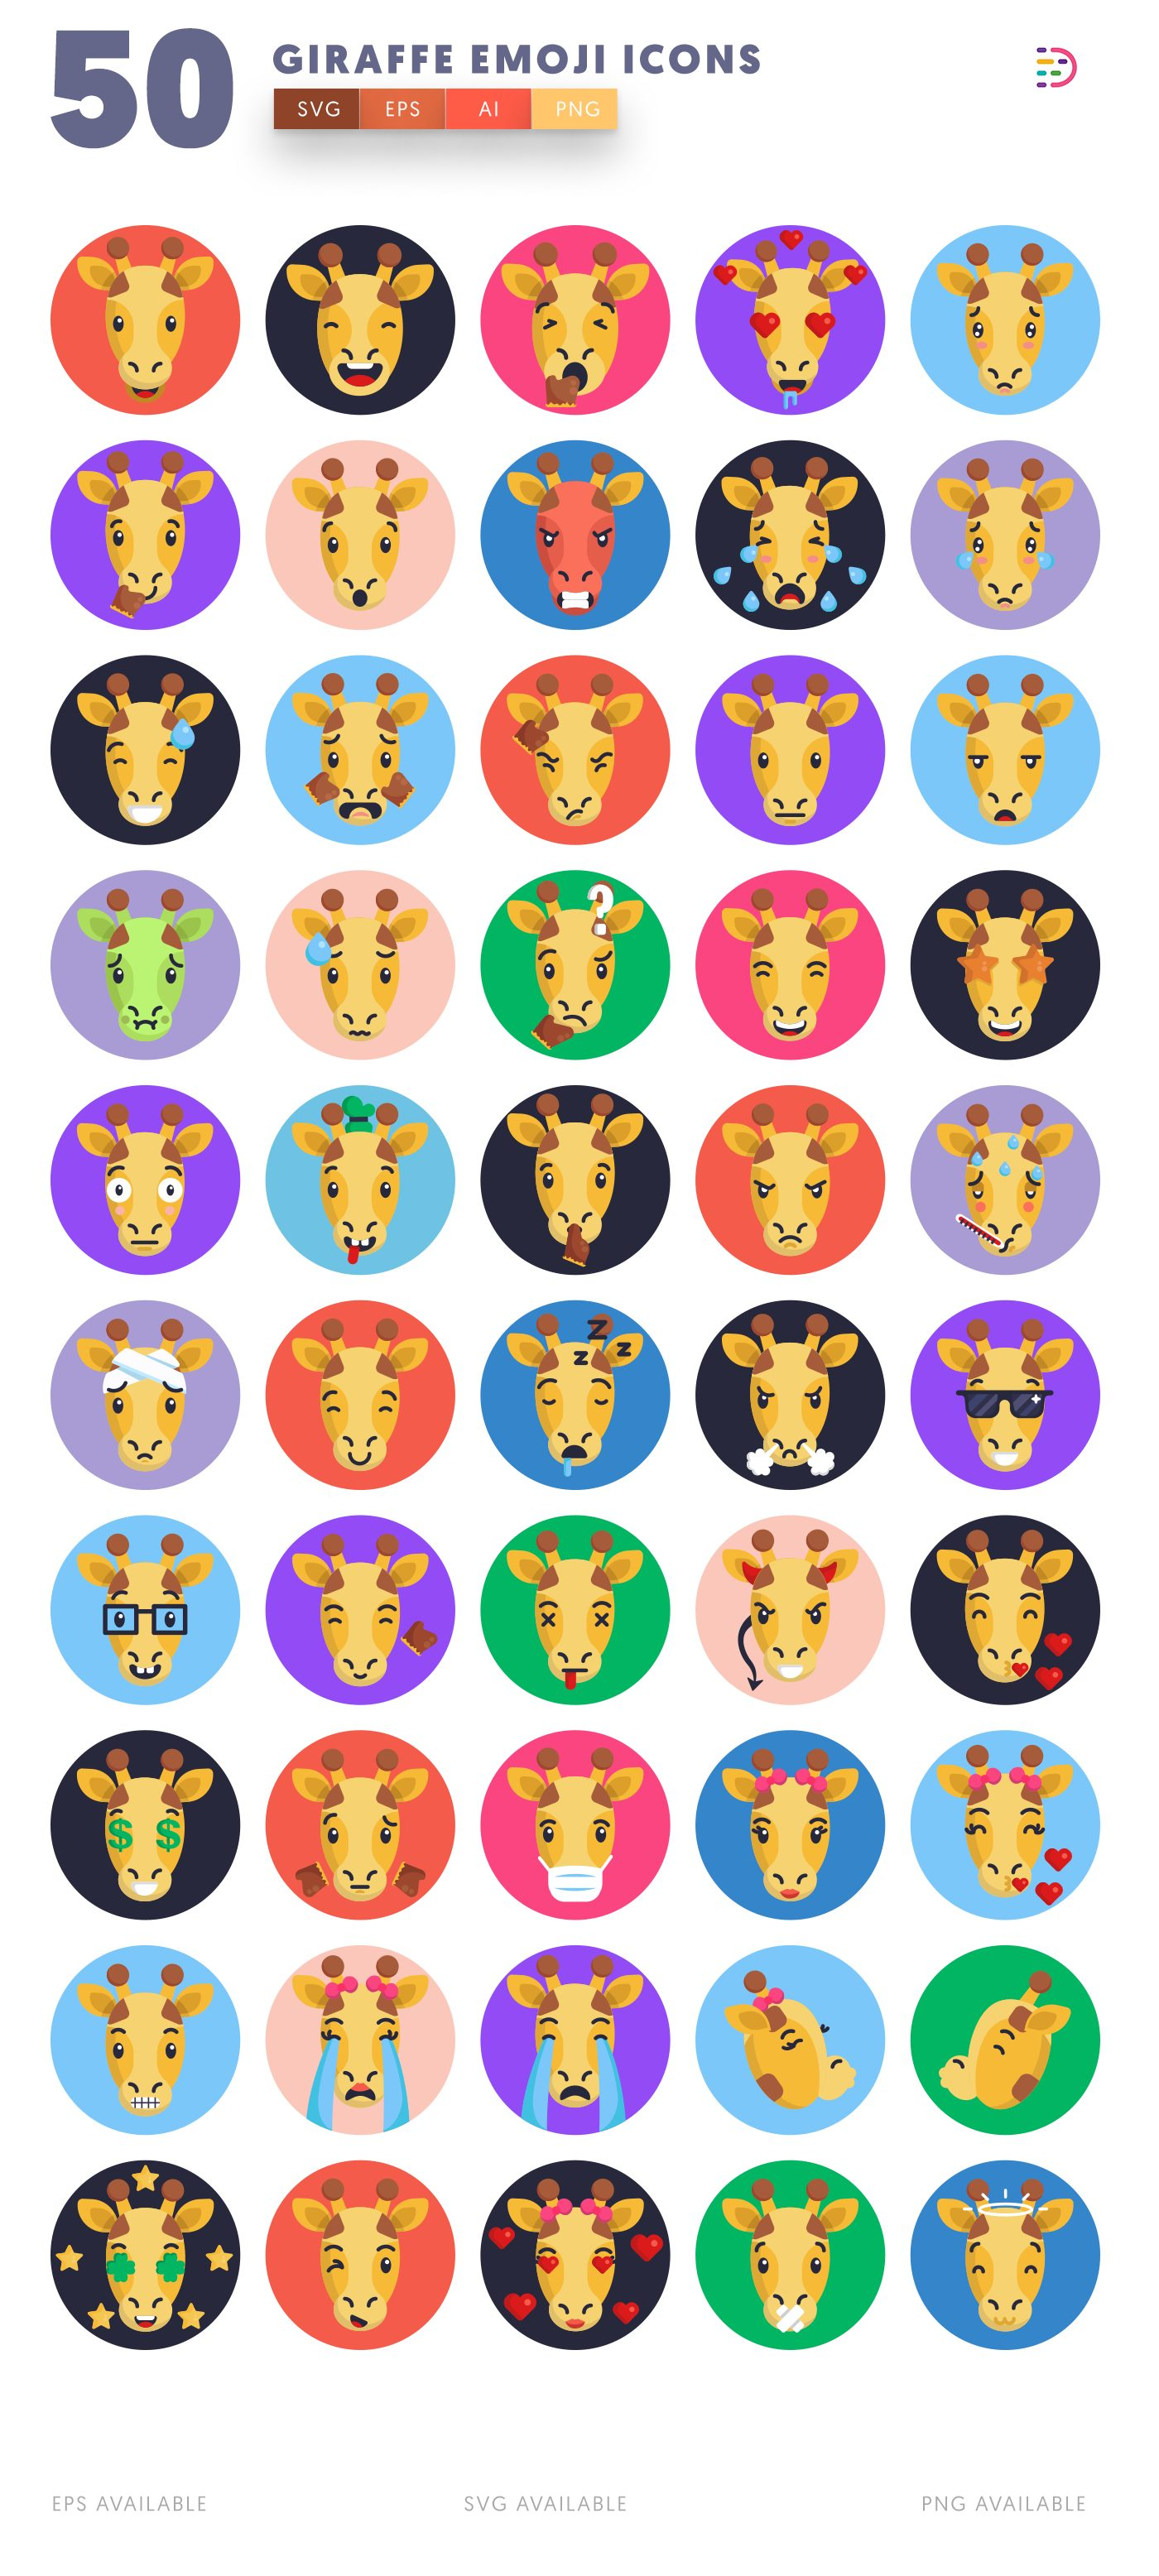 Giraffe Emoji icon pack